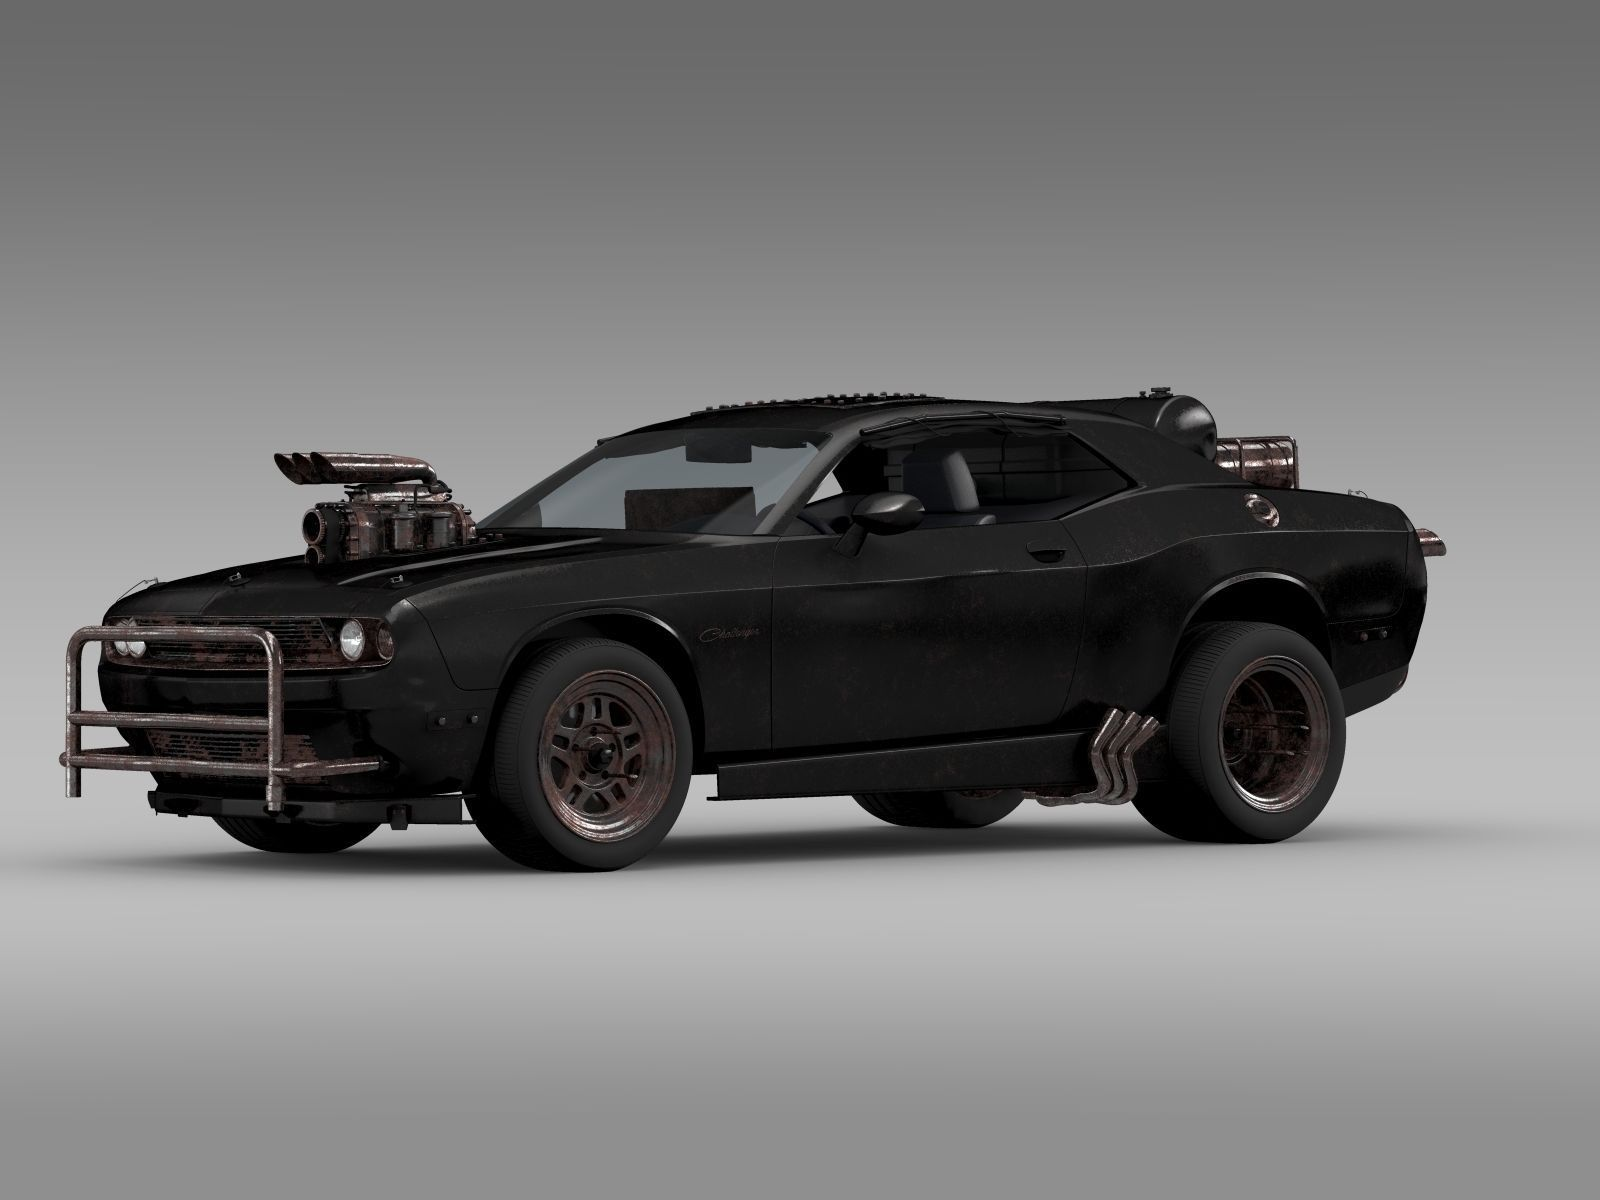 dodge challenger interceptor Mad Max Fight Interceptor Dodge Challenger 3D Model OBJ